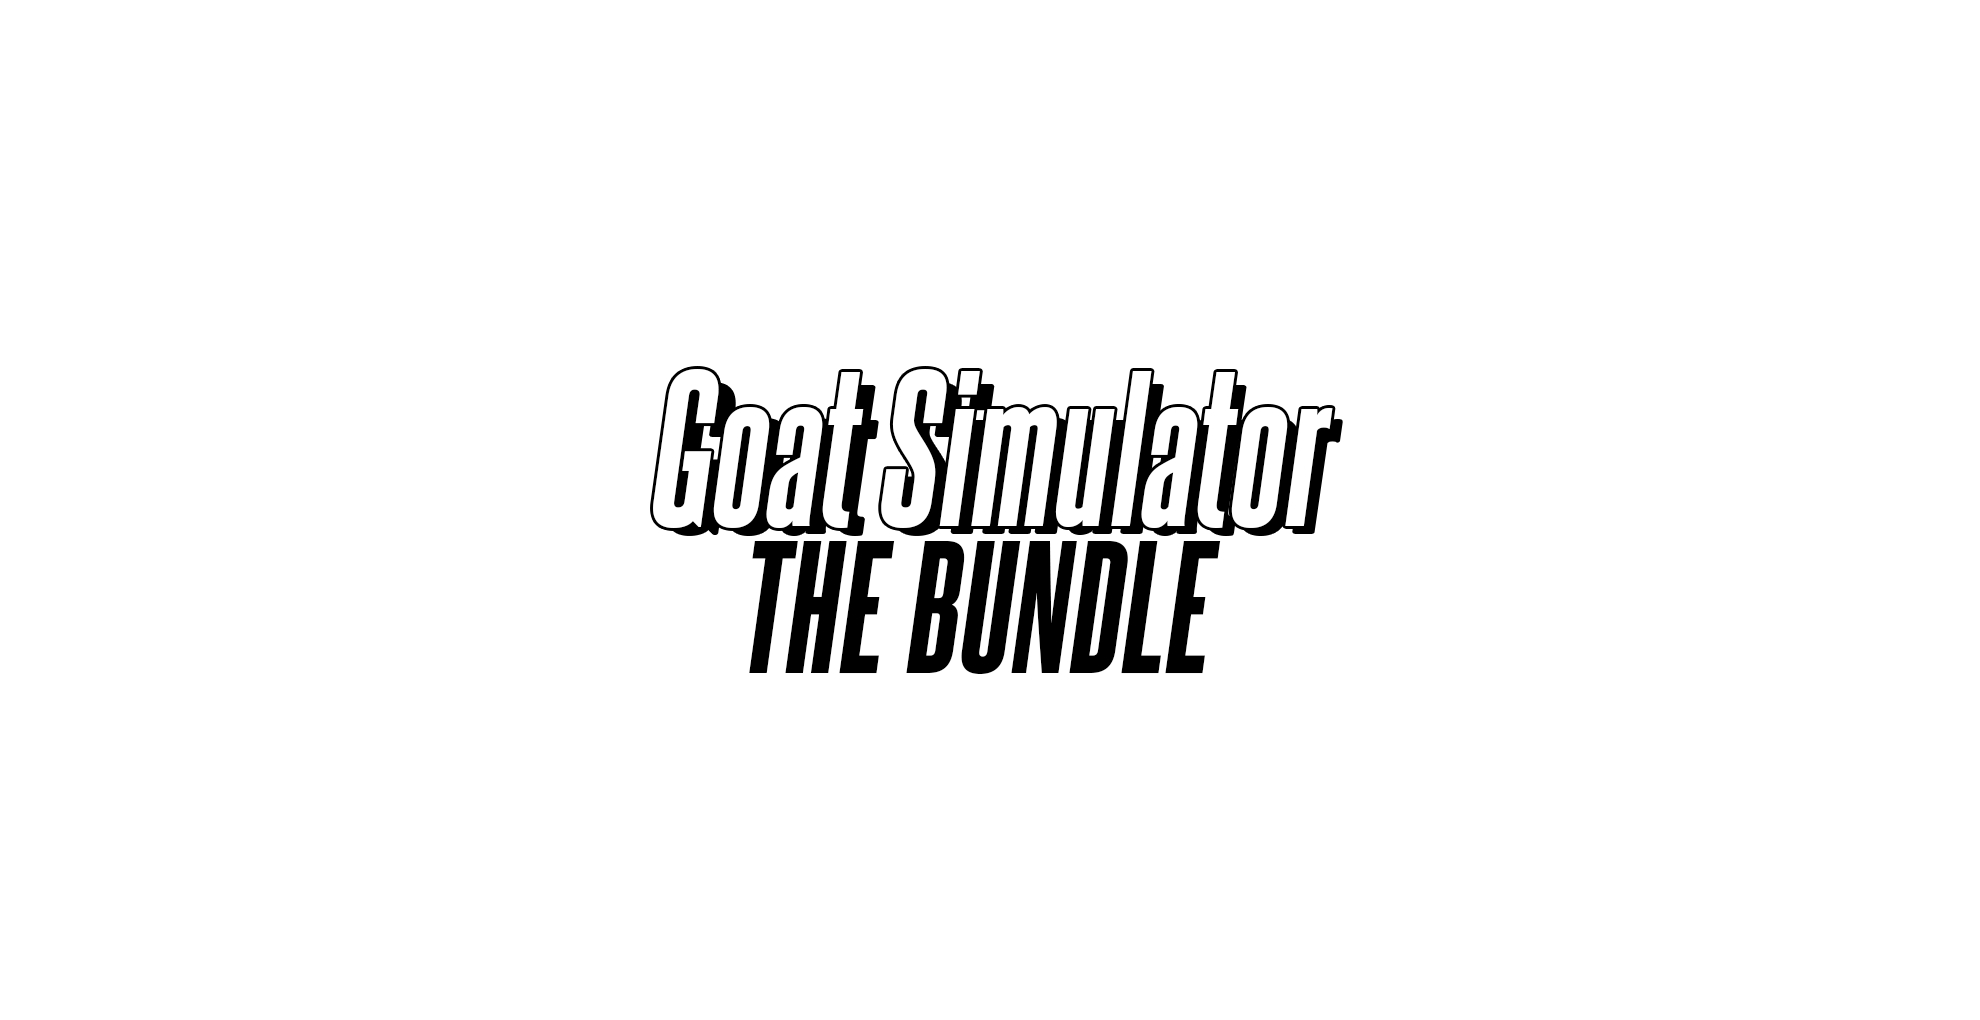 Goat Simulator: The Bundle für PlayStation 4 im Handel!